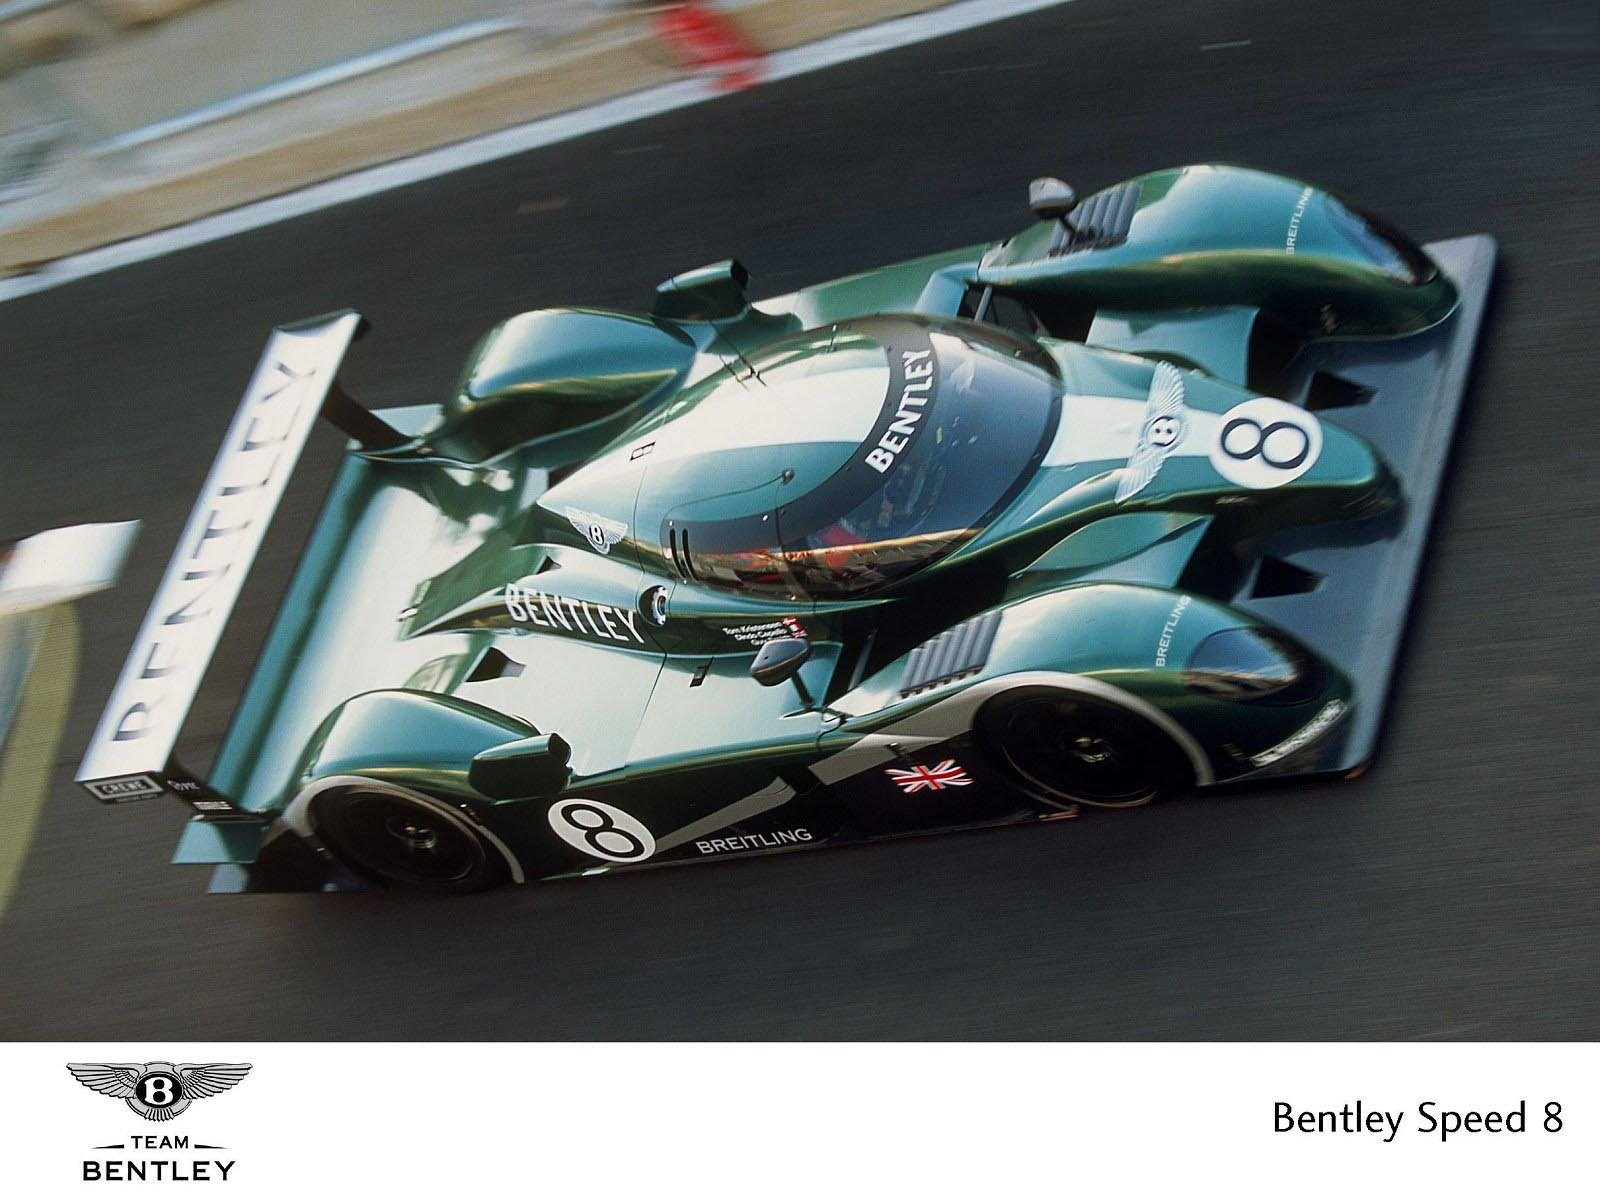 Car Racing Flag Wallpaper Bentley Speed 8 Group Gtp 2003 Racing Cars